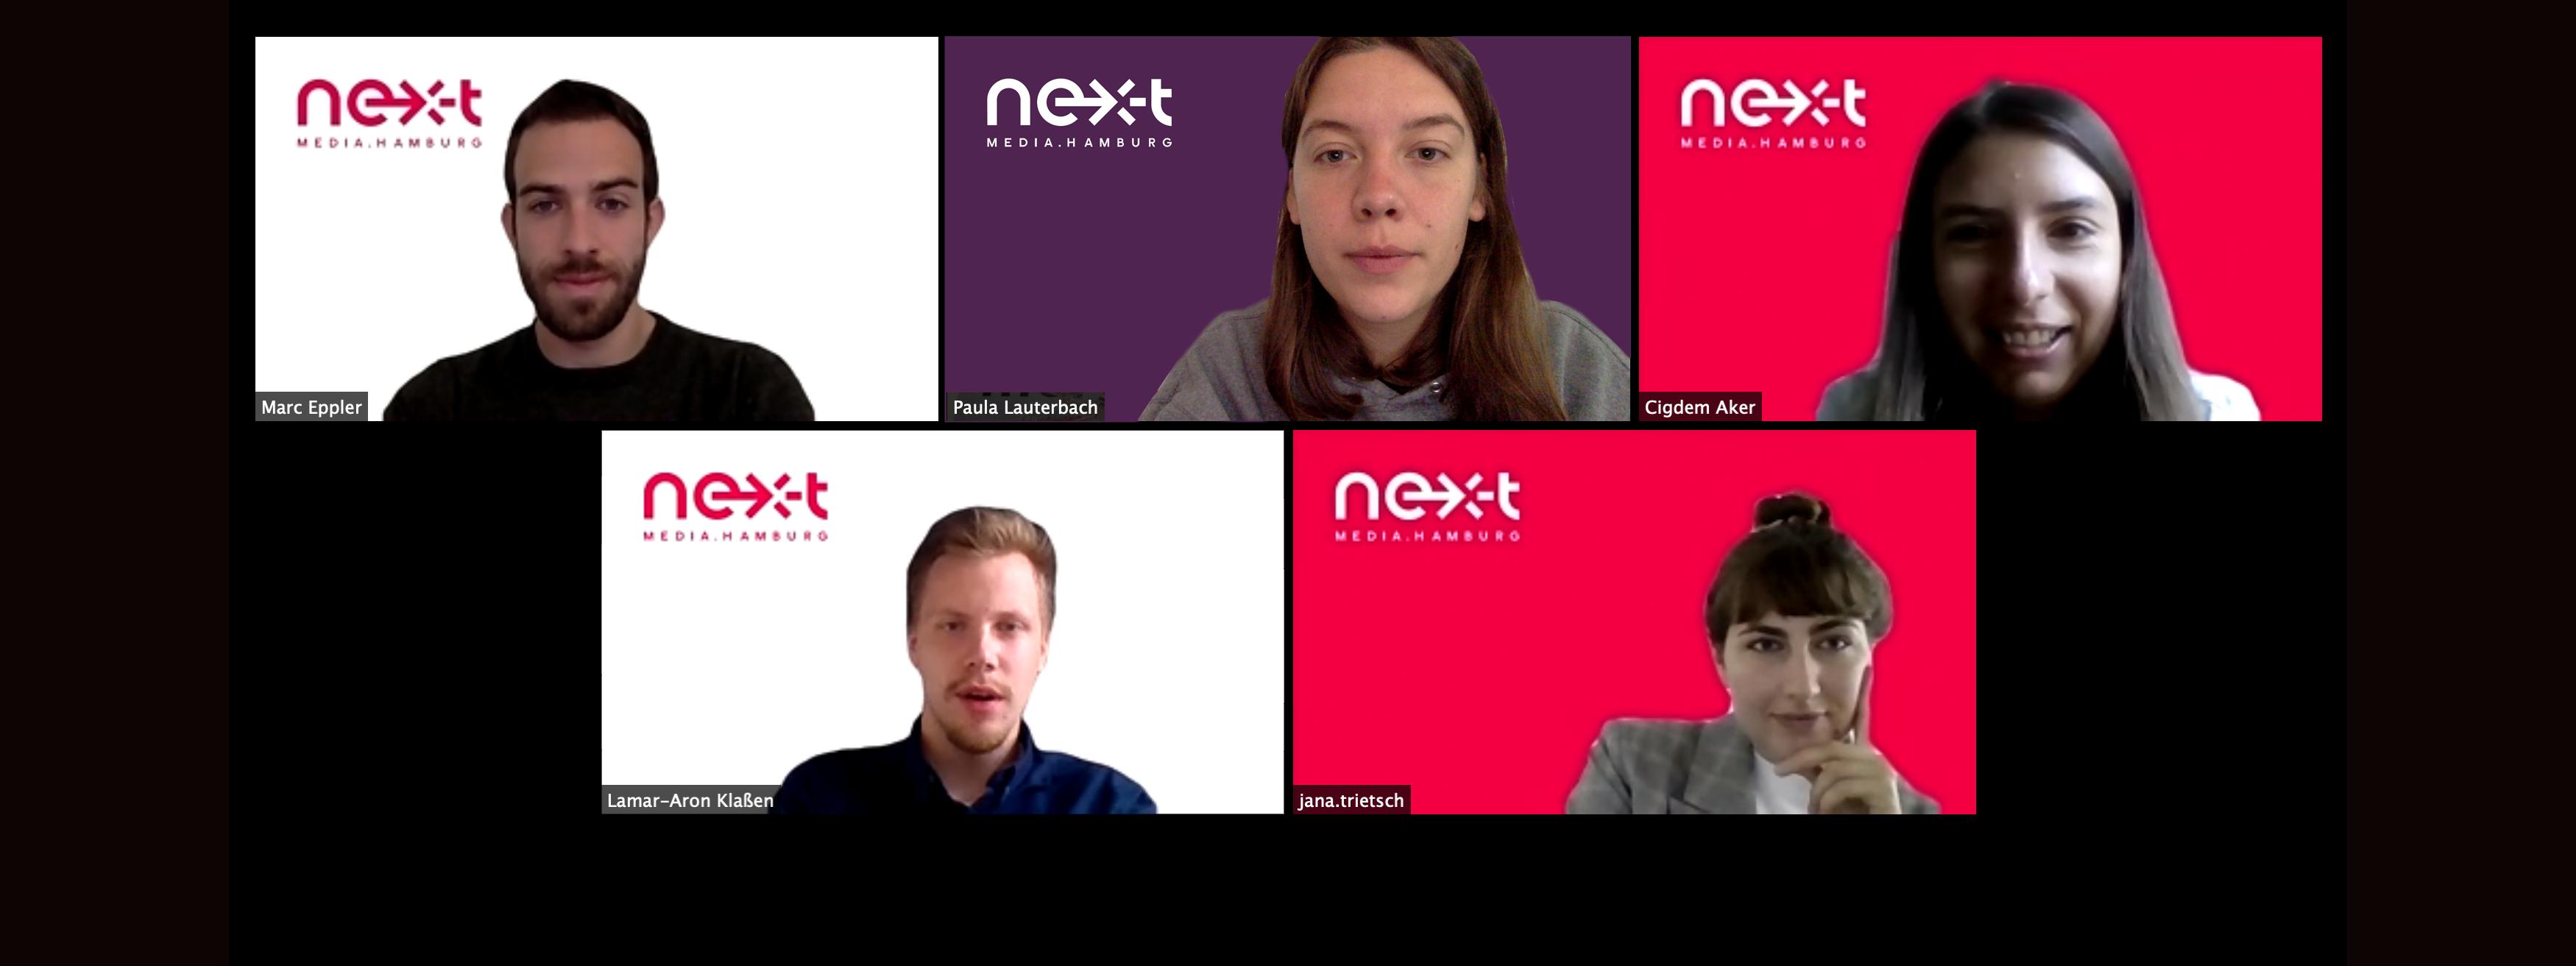 nextMedia.Hamburg - das Tema